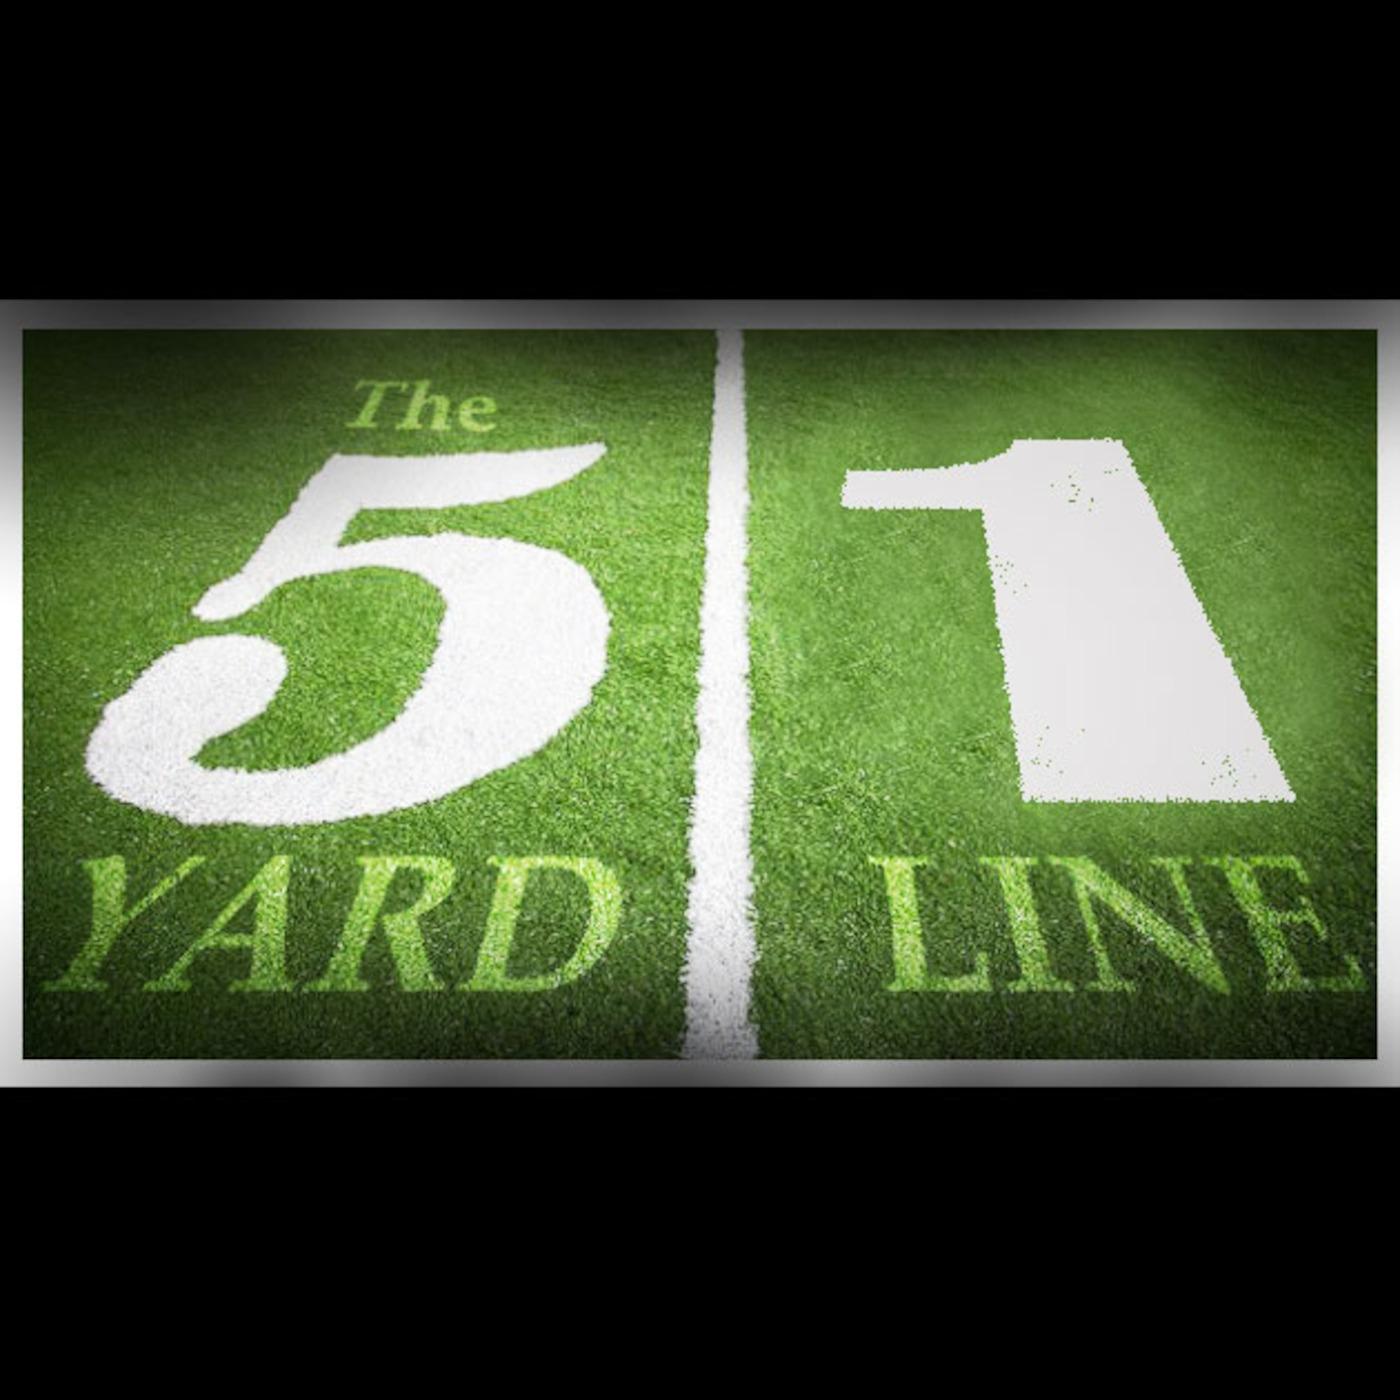 The 51 Yard Line